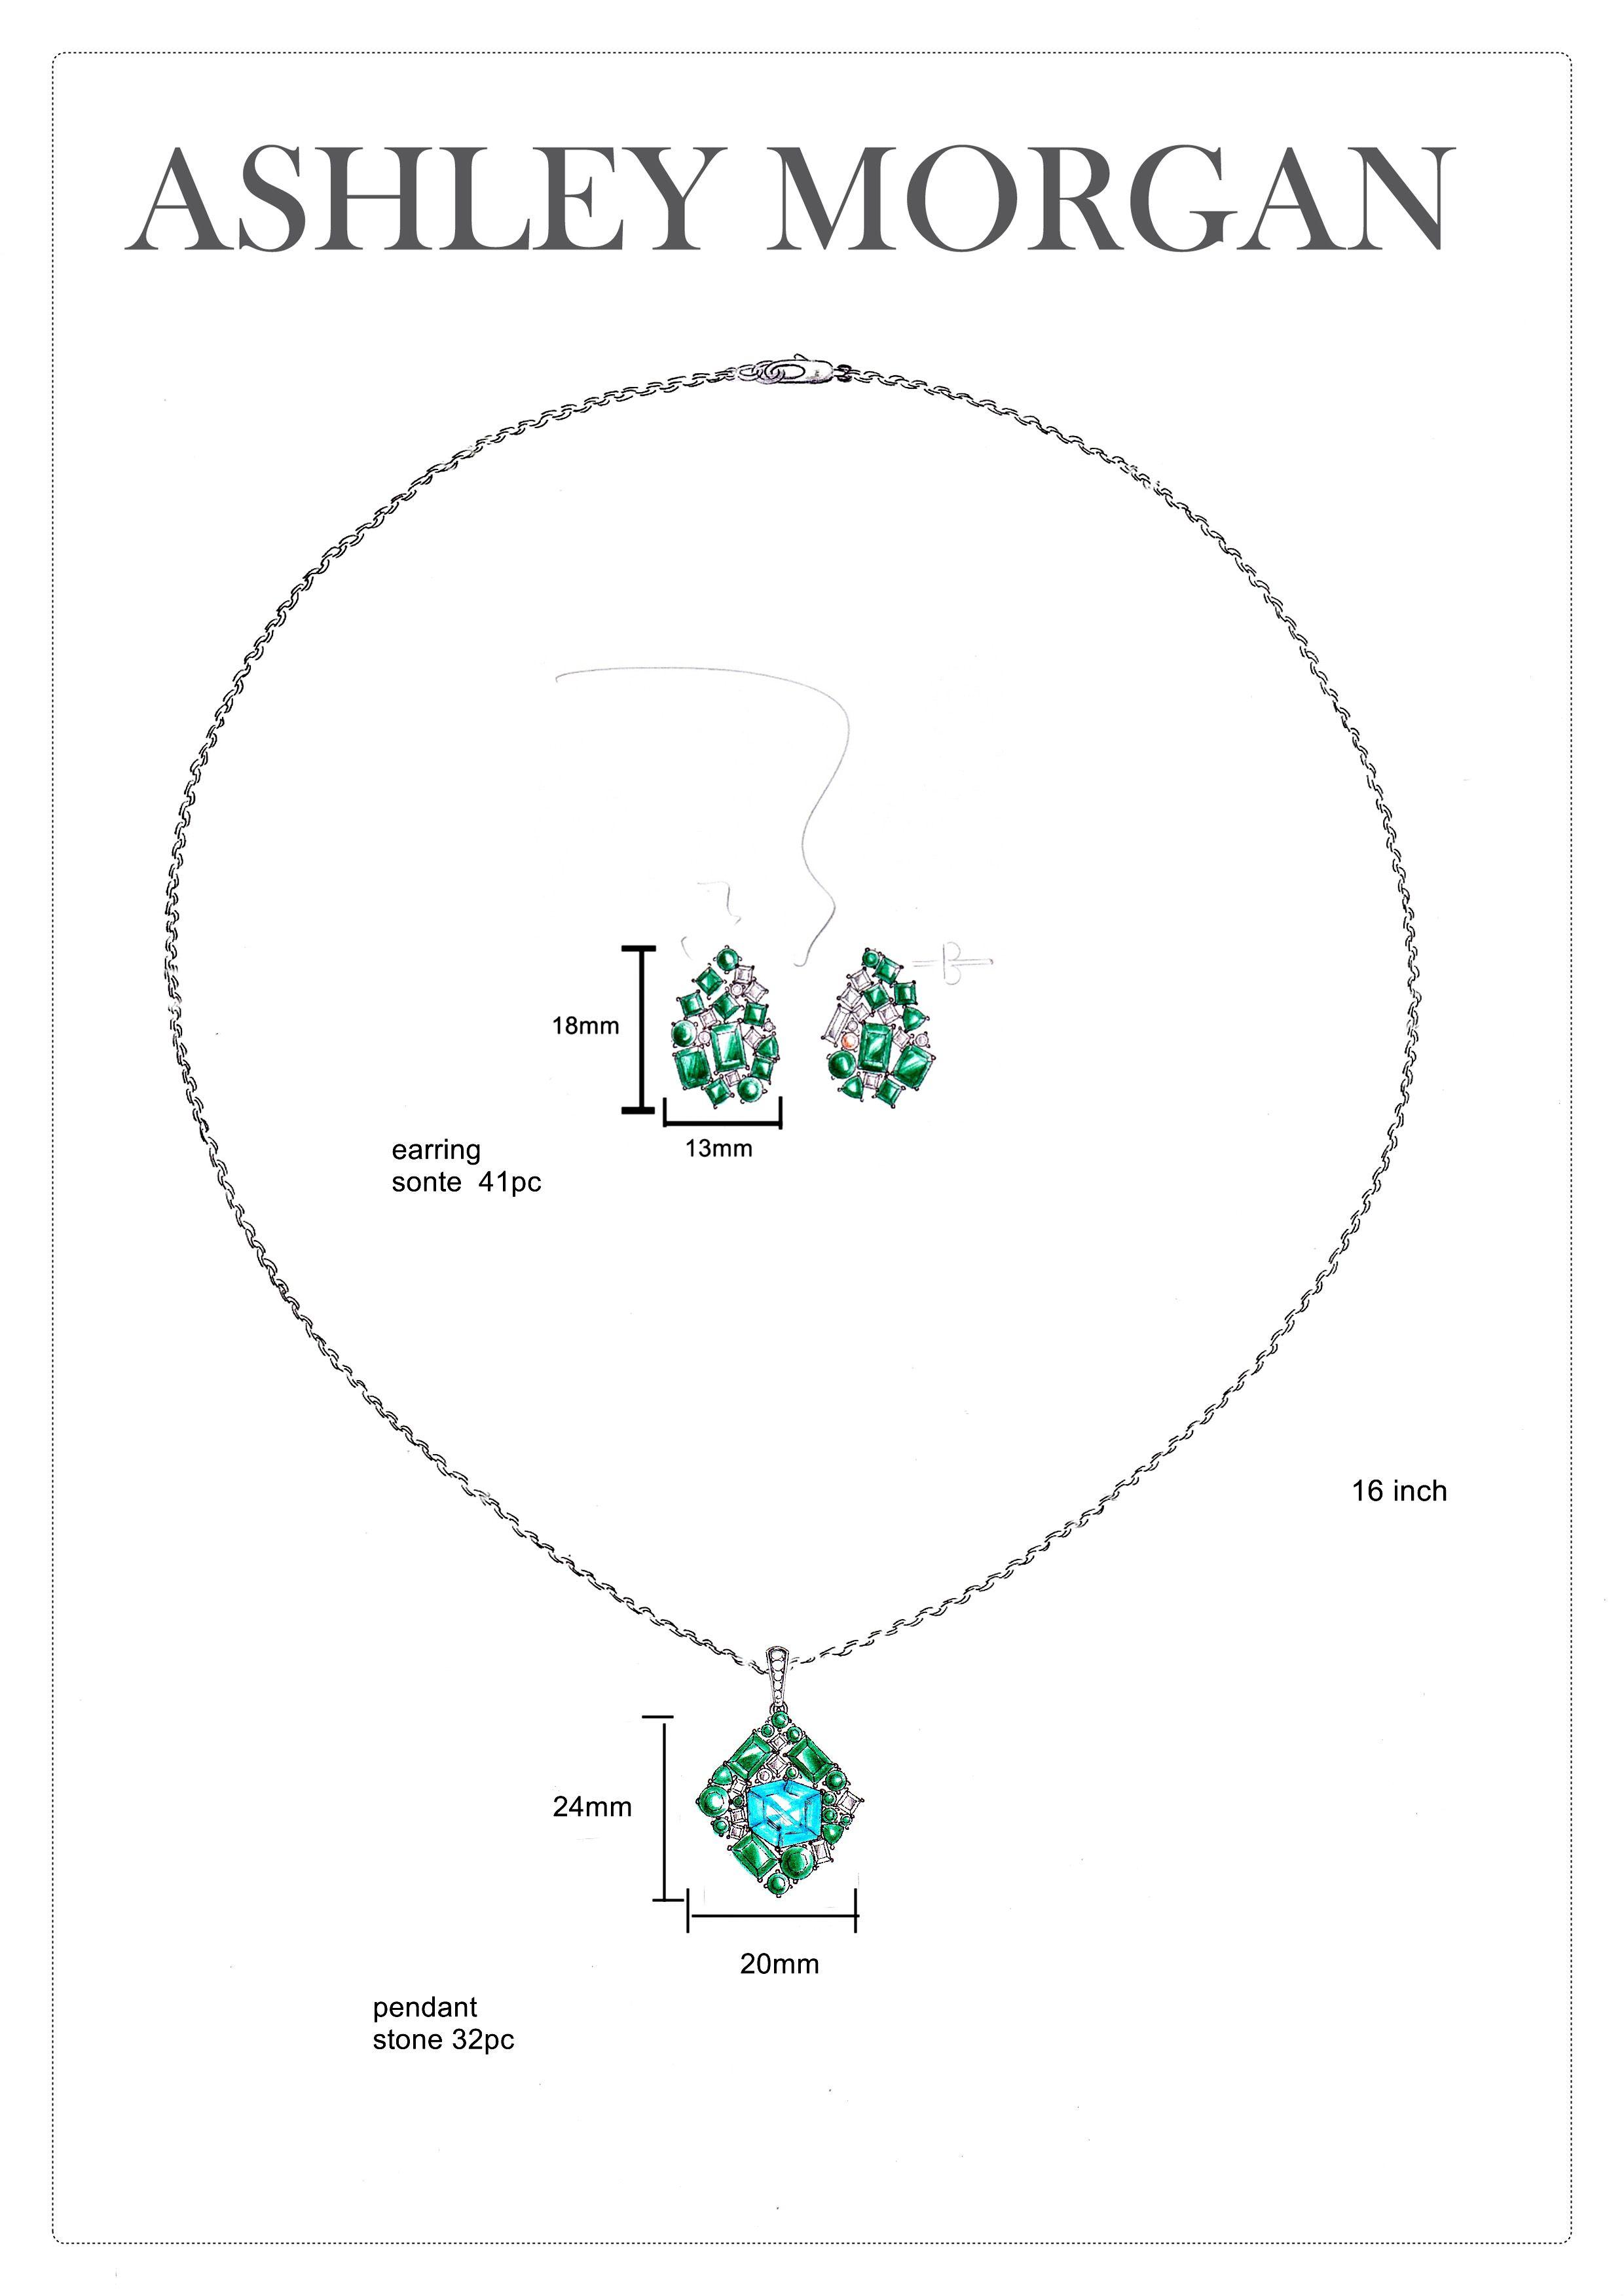 Ashley Morgan Emerald Tourmaline And Aqua Cluster Pendant